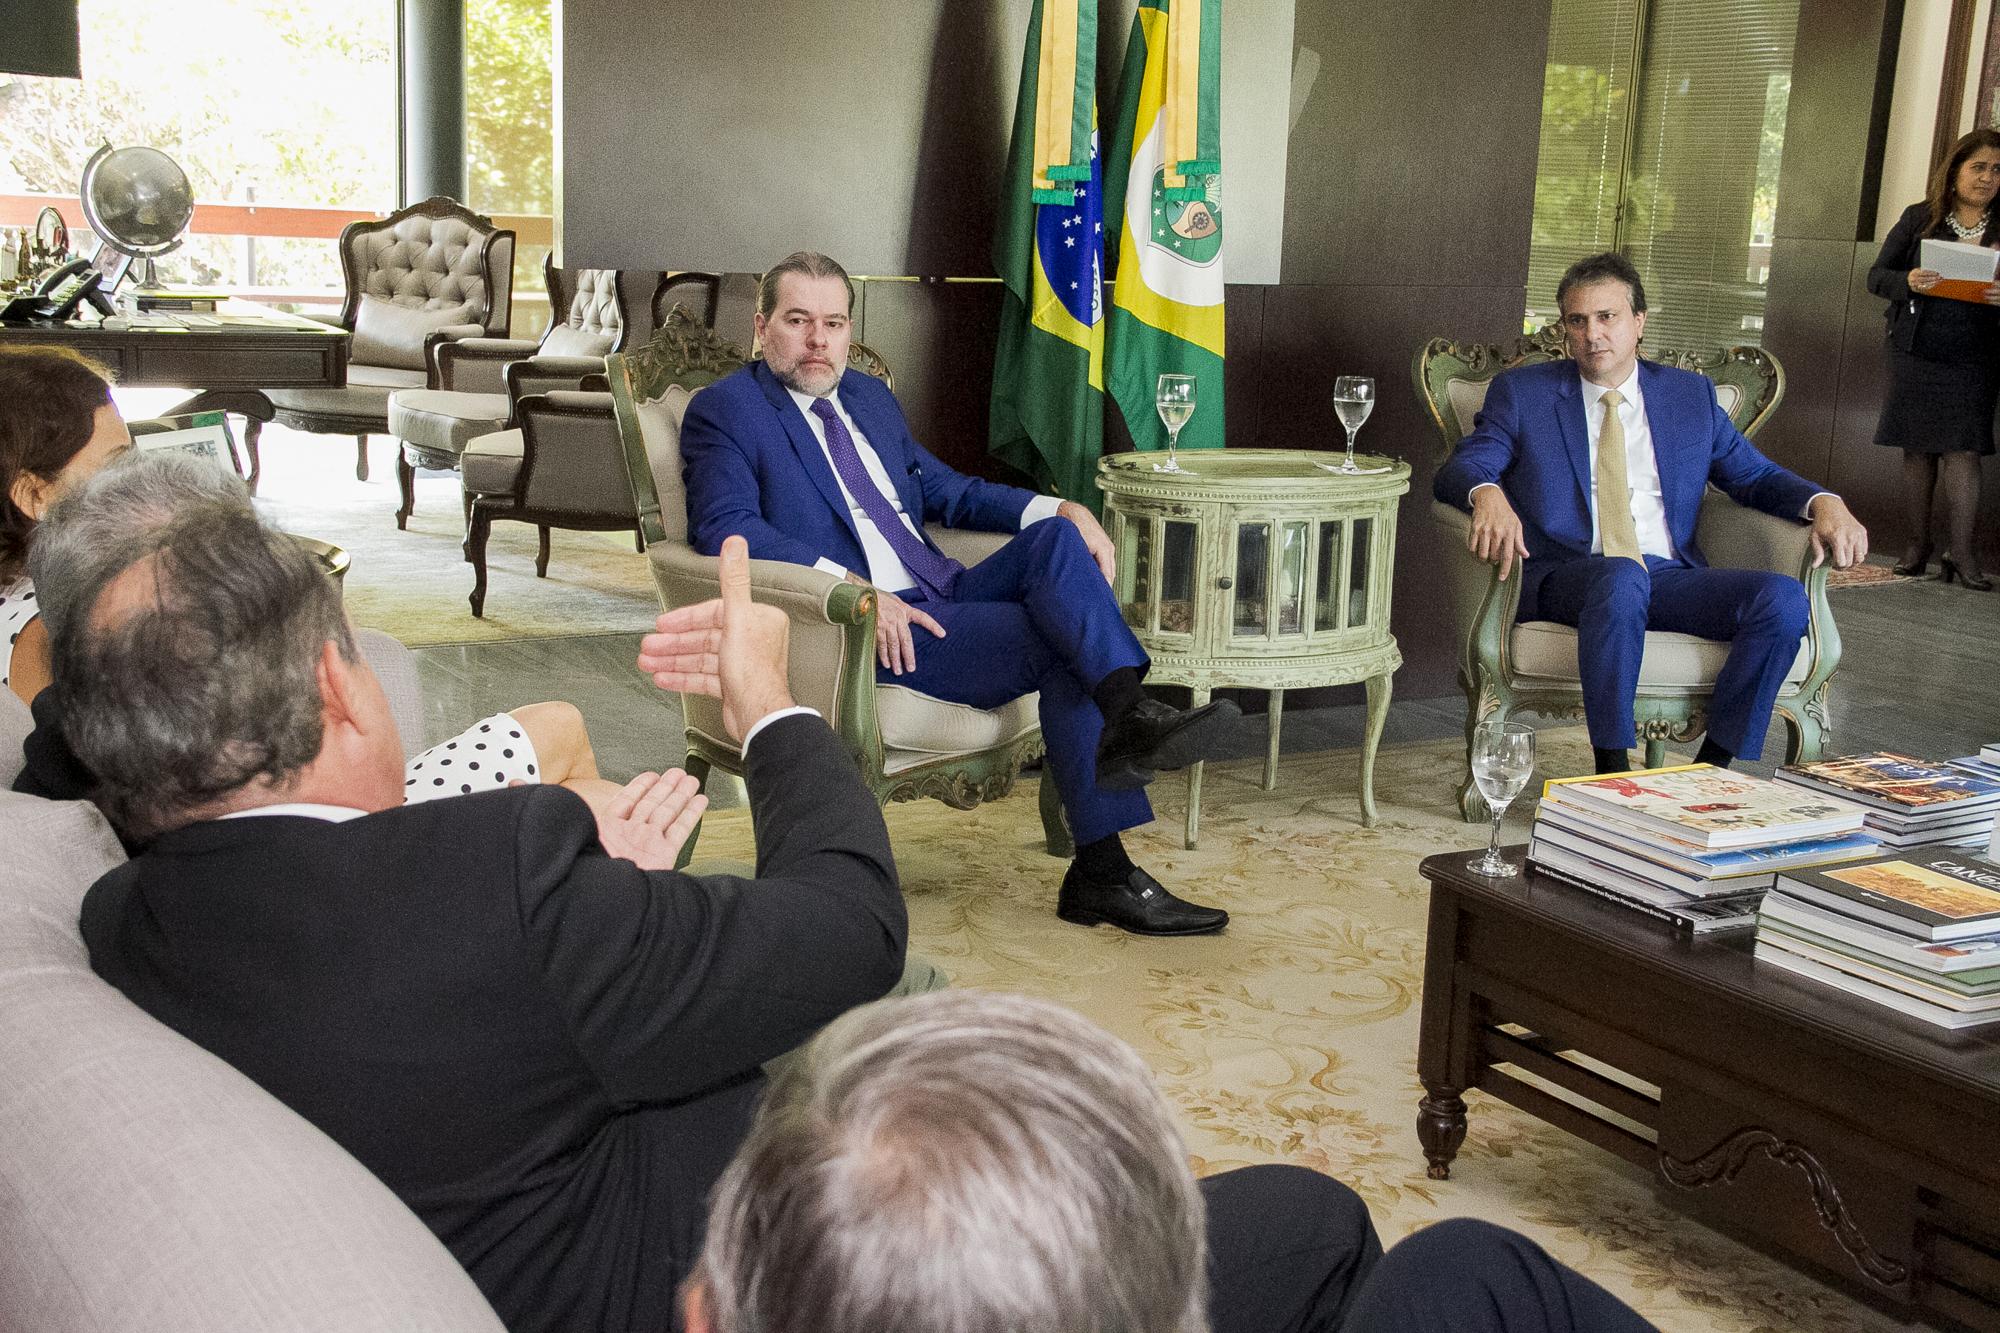 Governo do Ceará recebe visita do presidente do Supremo Tribunal Federal